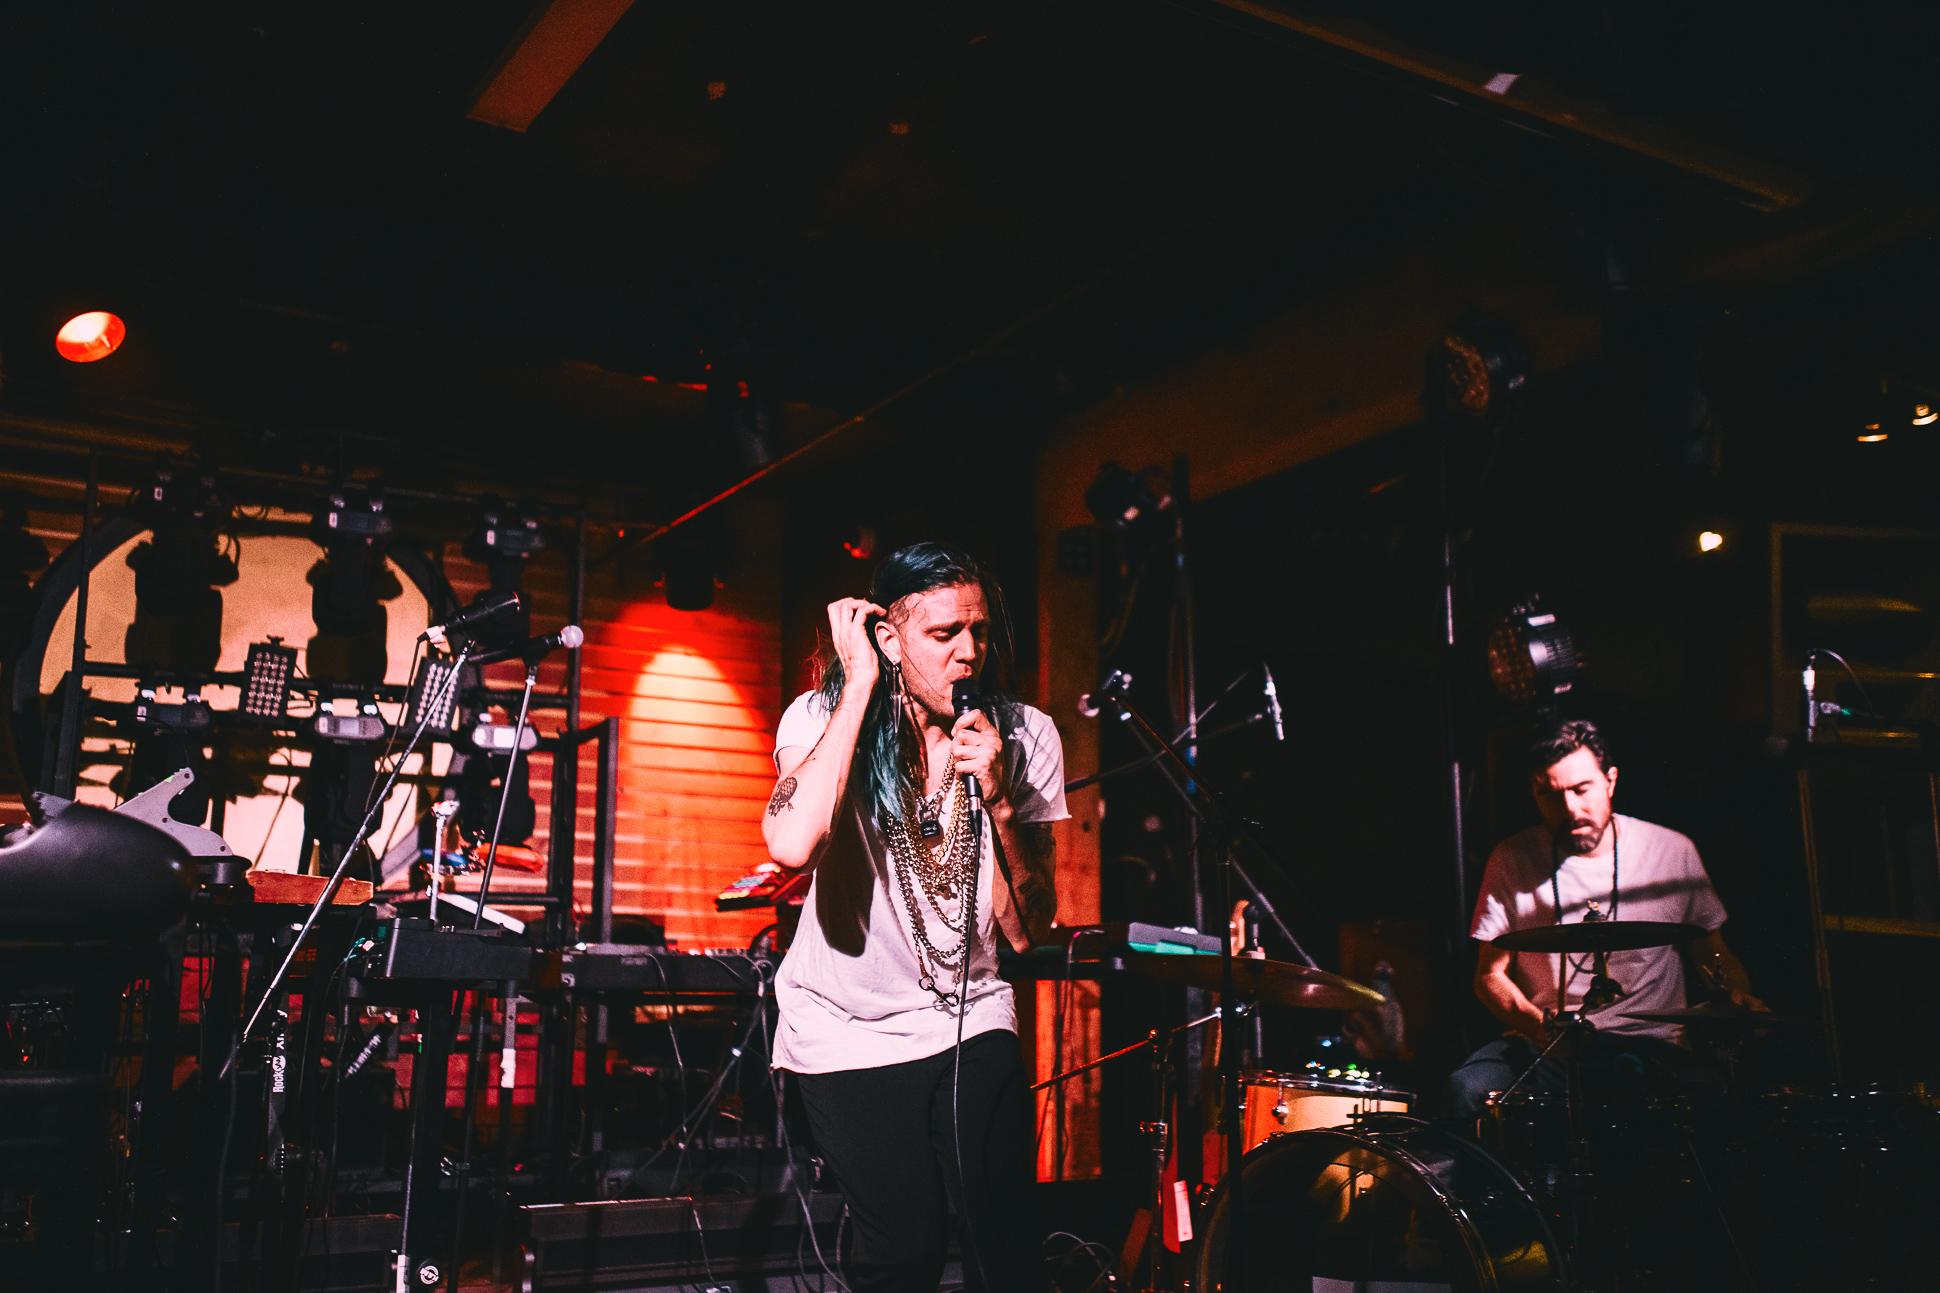 YoungAndSick-FortuneSoundClub-24-01-2019-Vancouver-20.jpg